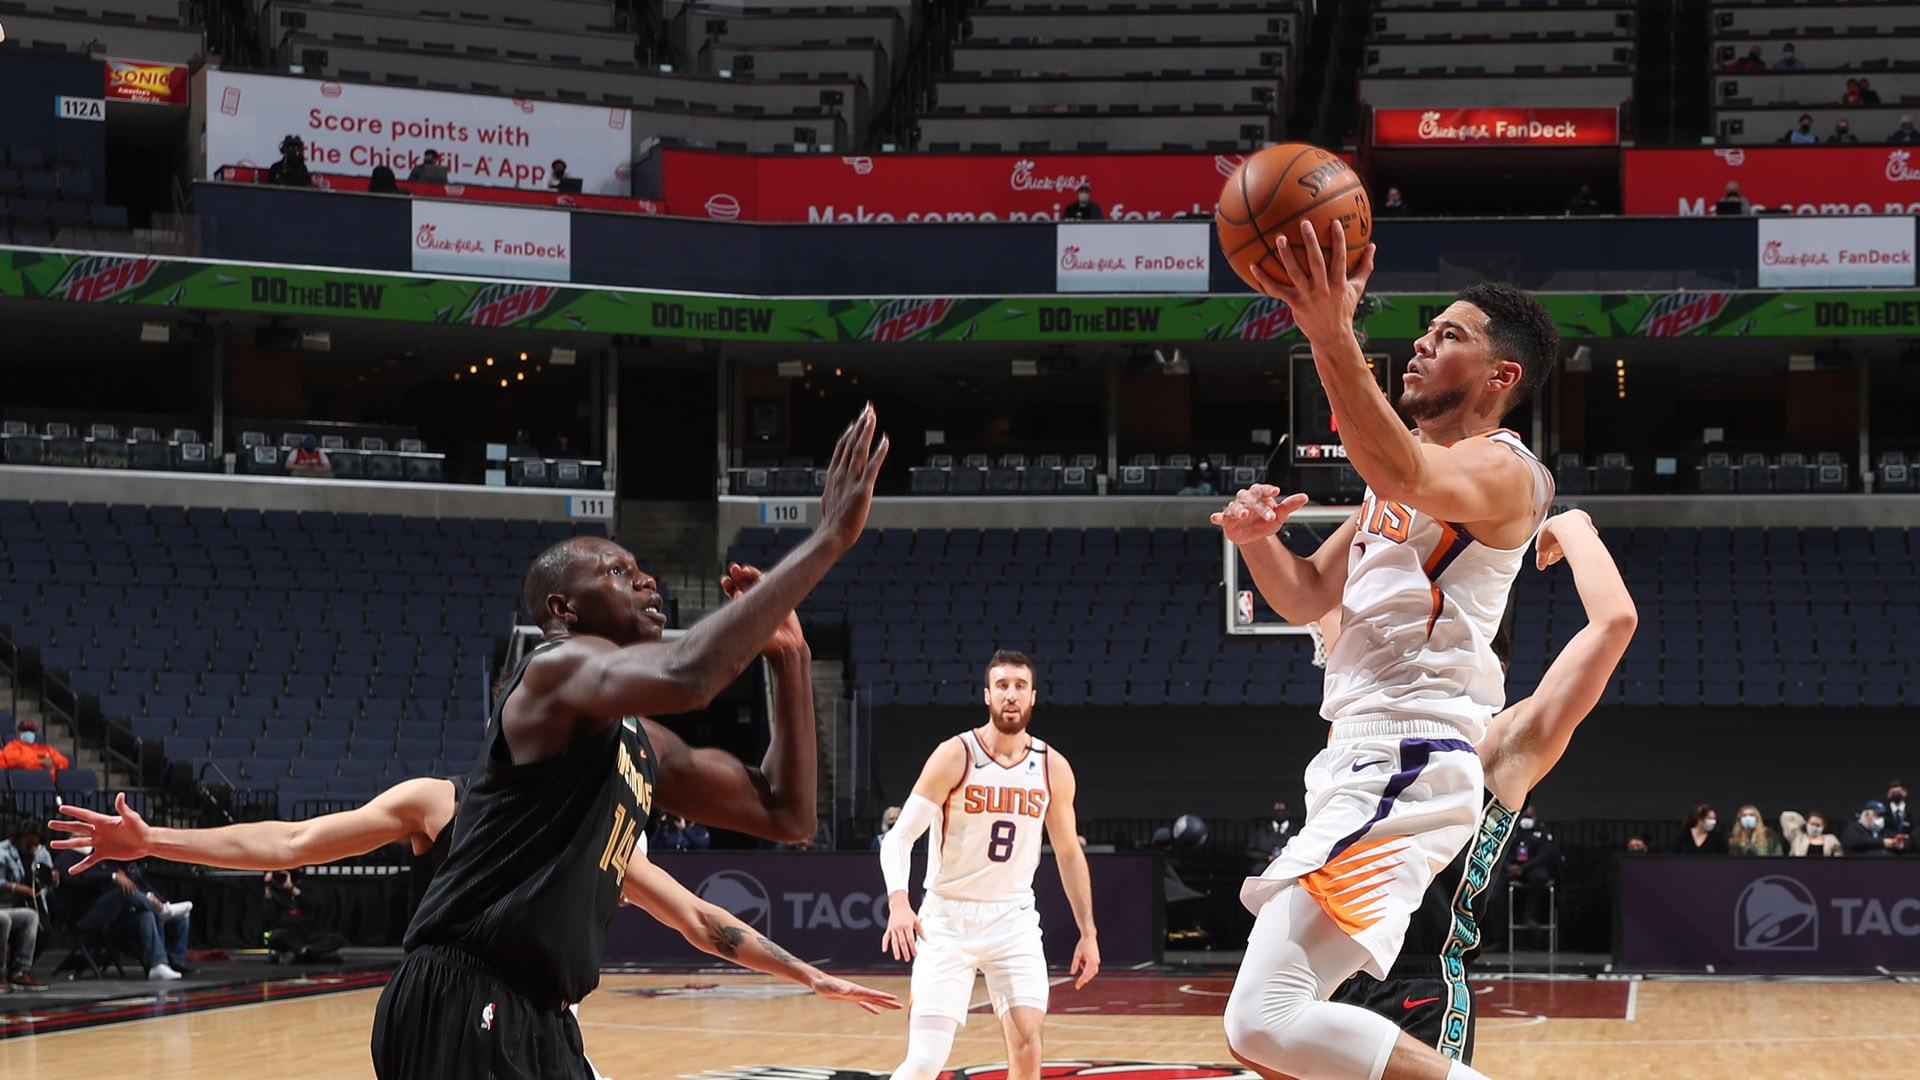 Superstar Guards Clash As Grizzlies Host Suns